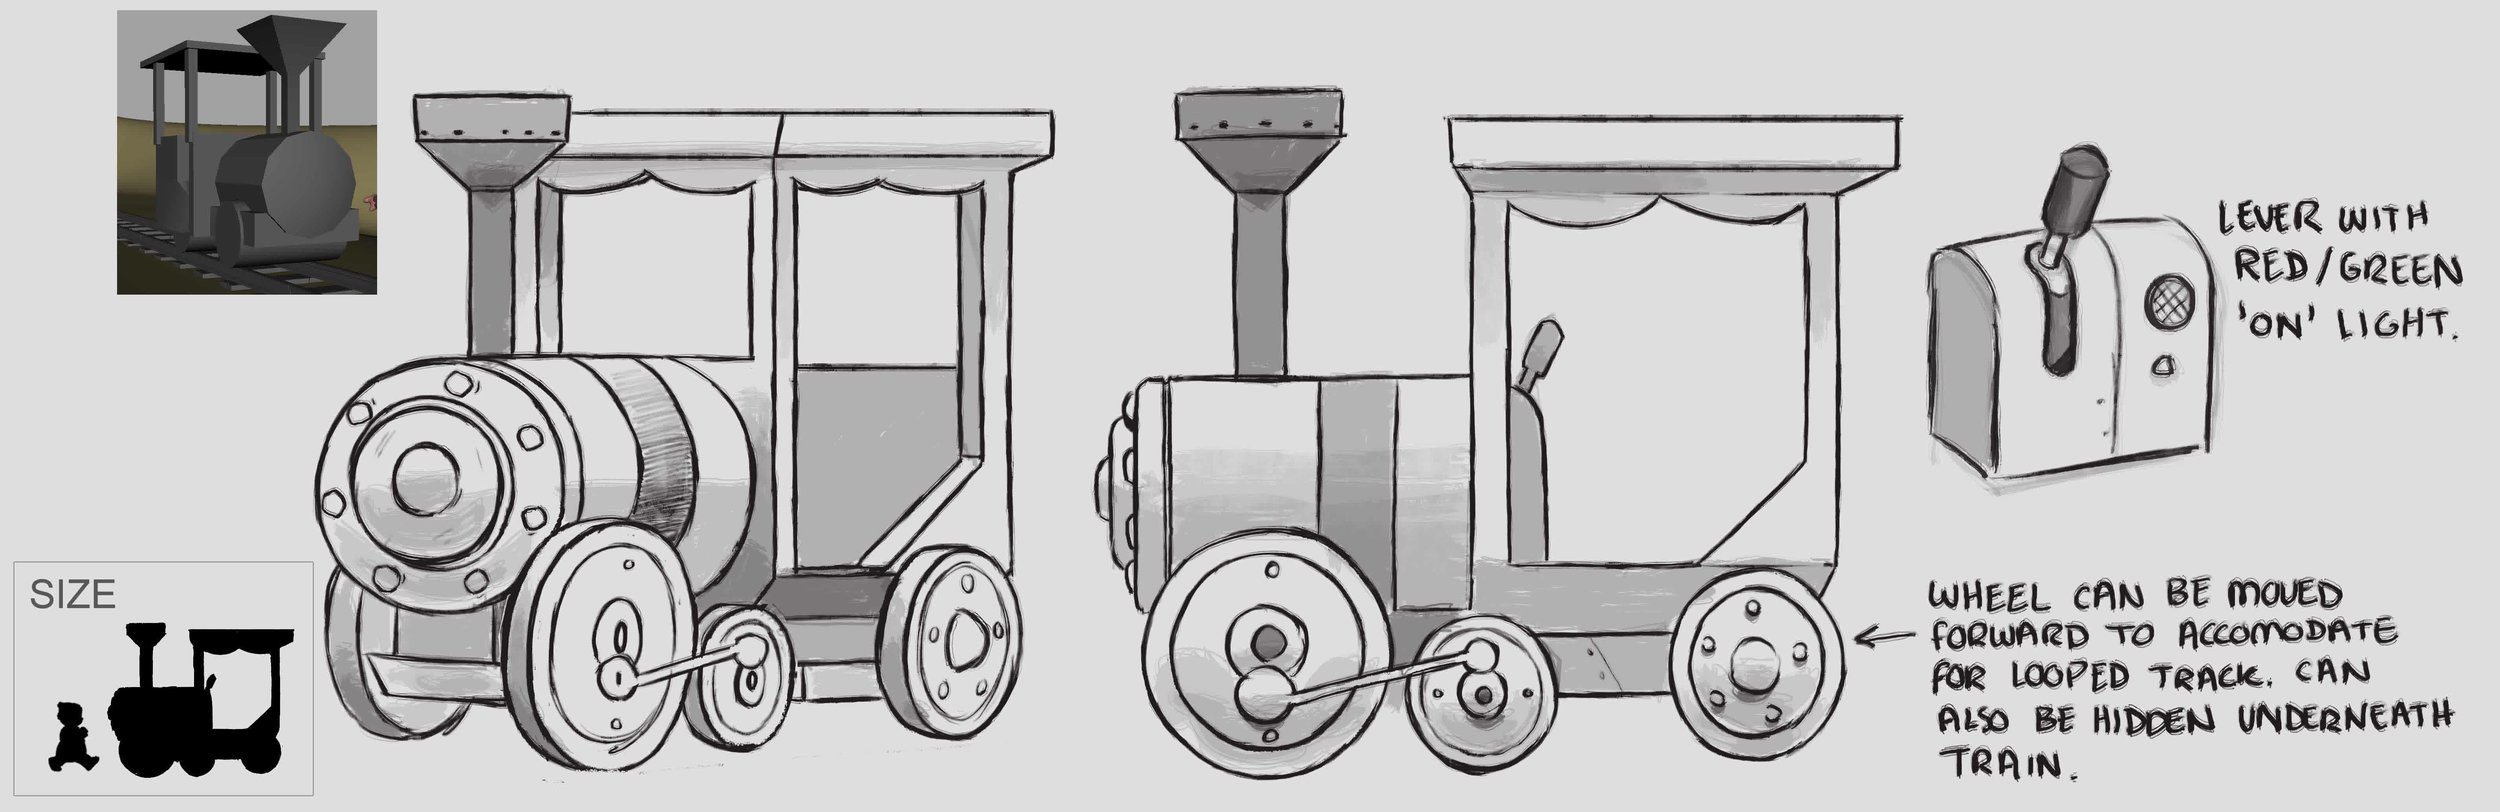 PROPS_Locomotive_DESIGN_PAFHANNALocomotiveDesign.v001_thumb.jpg